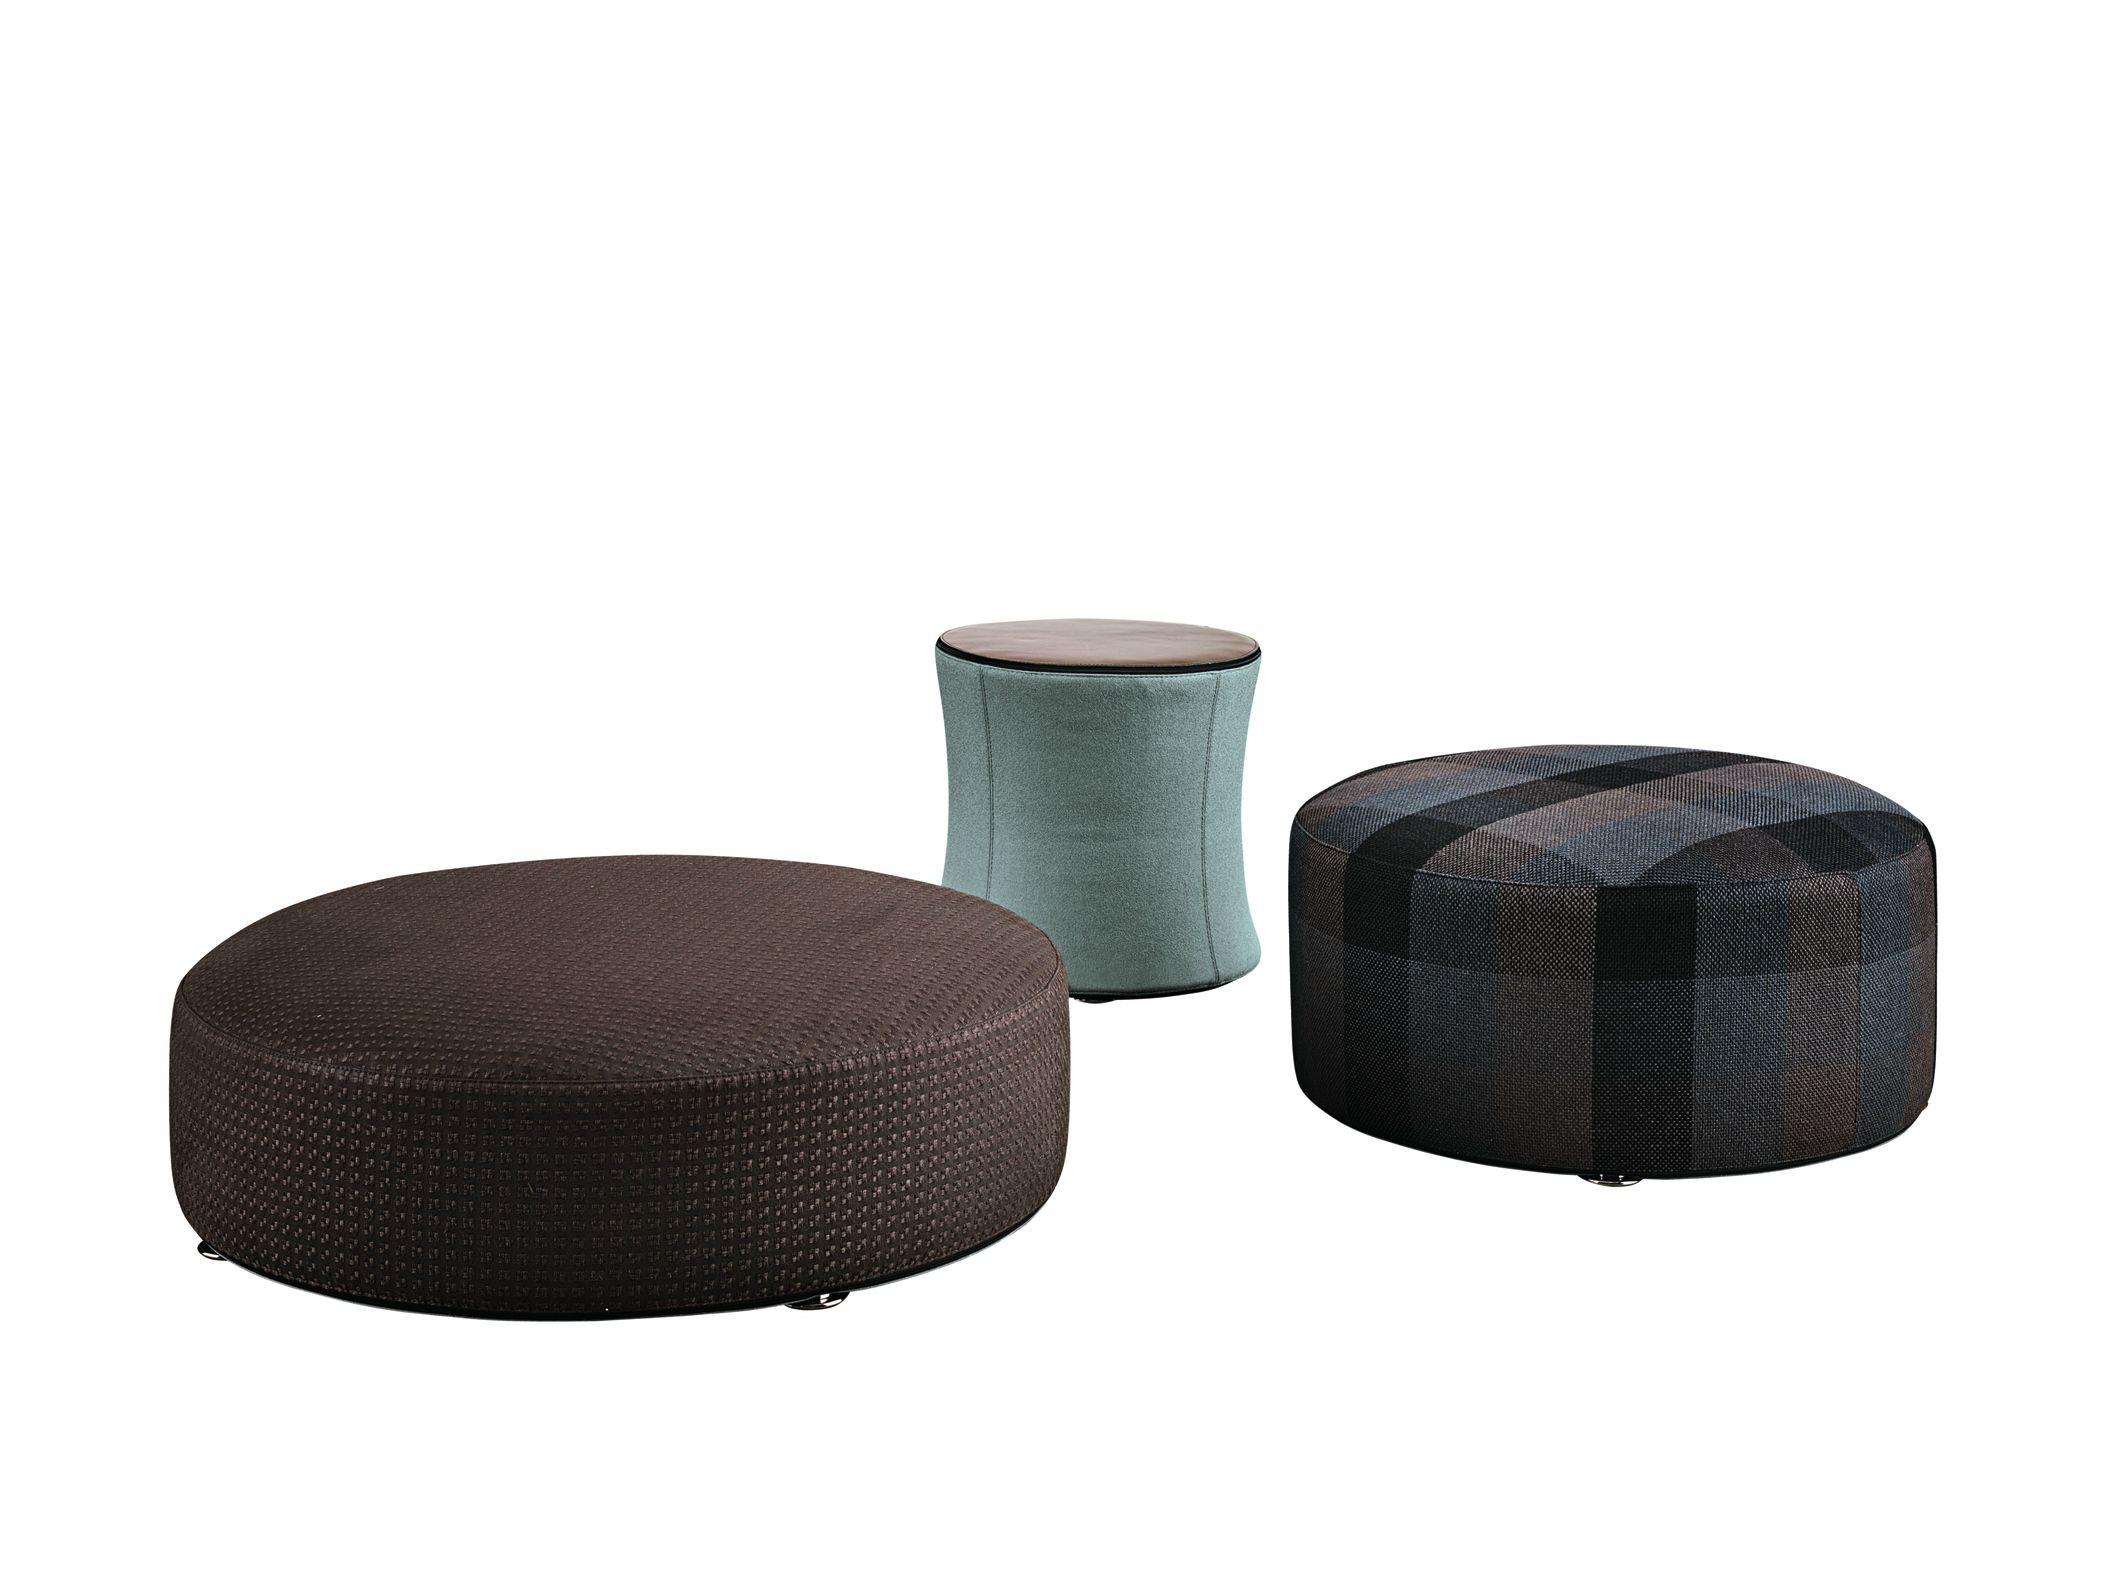 pouf ottoman davis by minotti design rodolfo dordoni. Black Bedroom Furniture Sets. Home Design Ideas